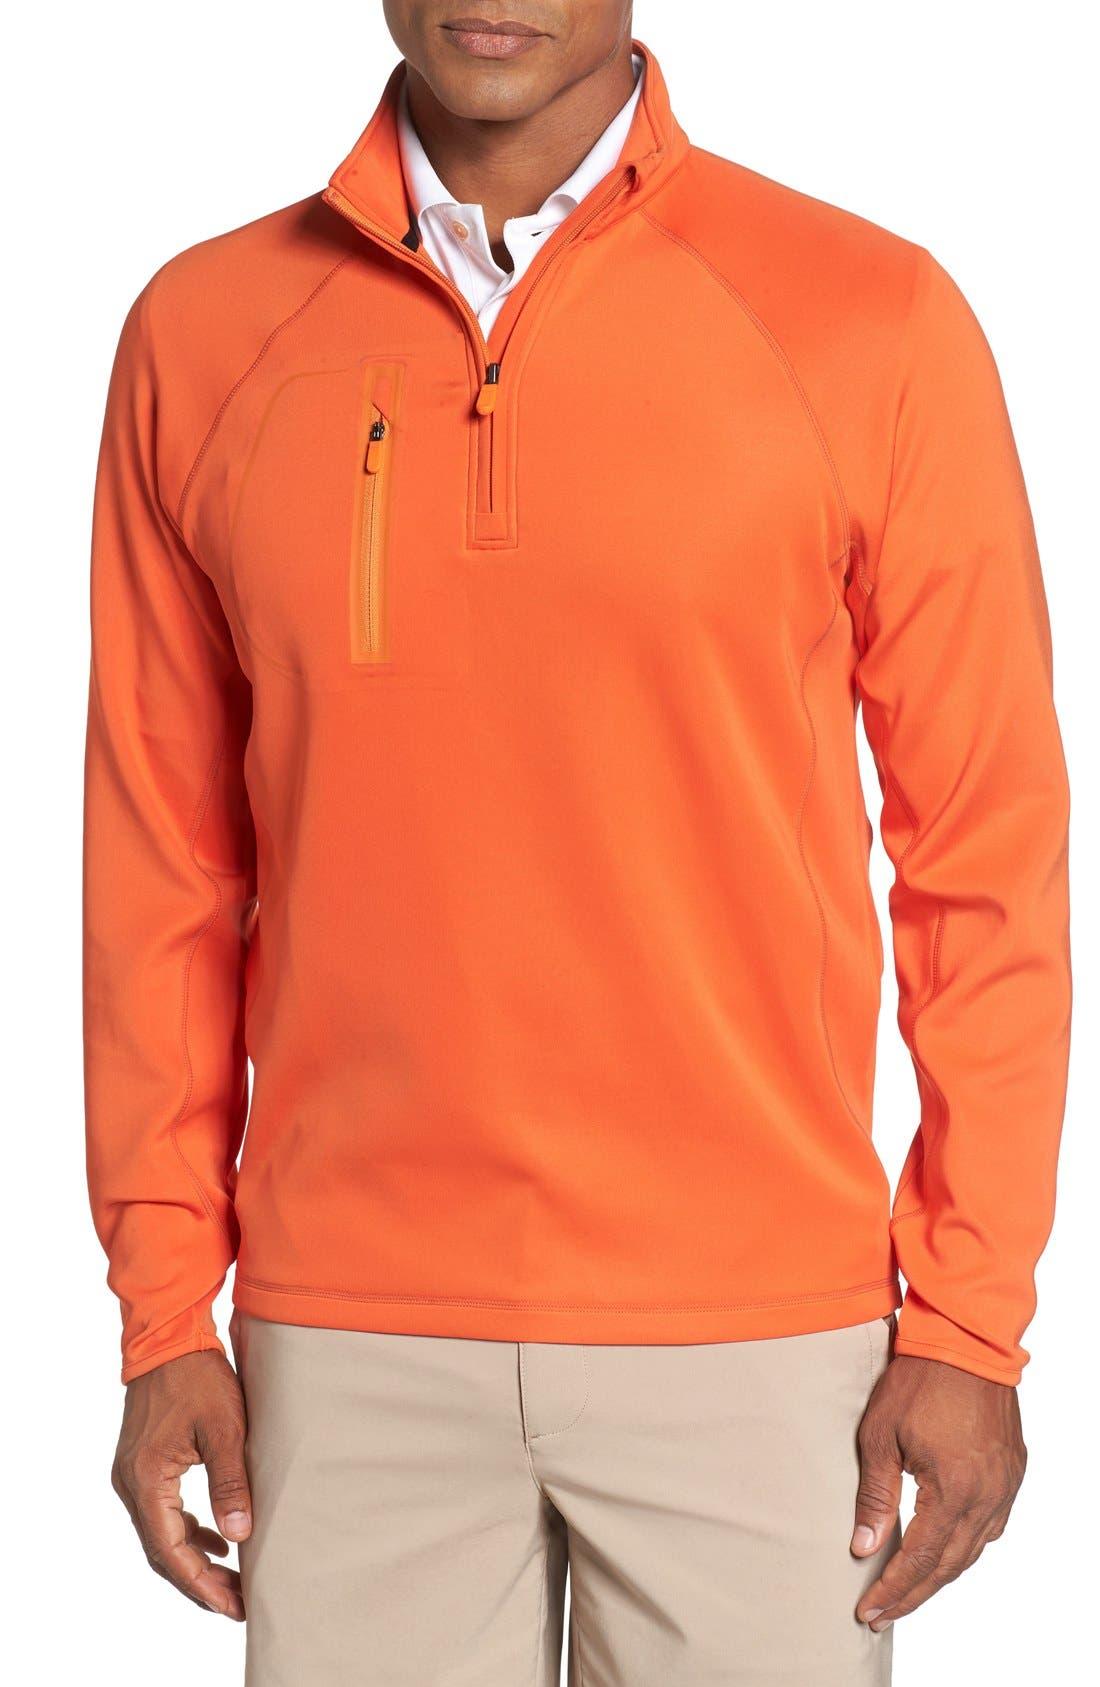 Bobby Jones XH2O Crawford Stretch Quarter Zip Golf Pullover